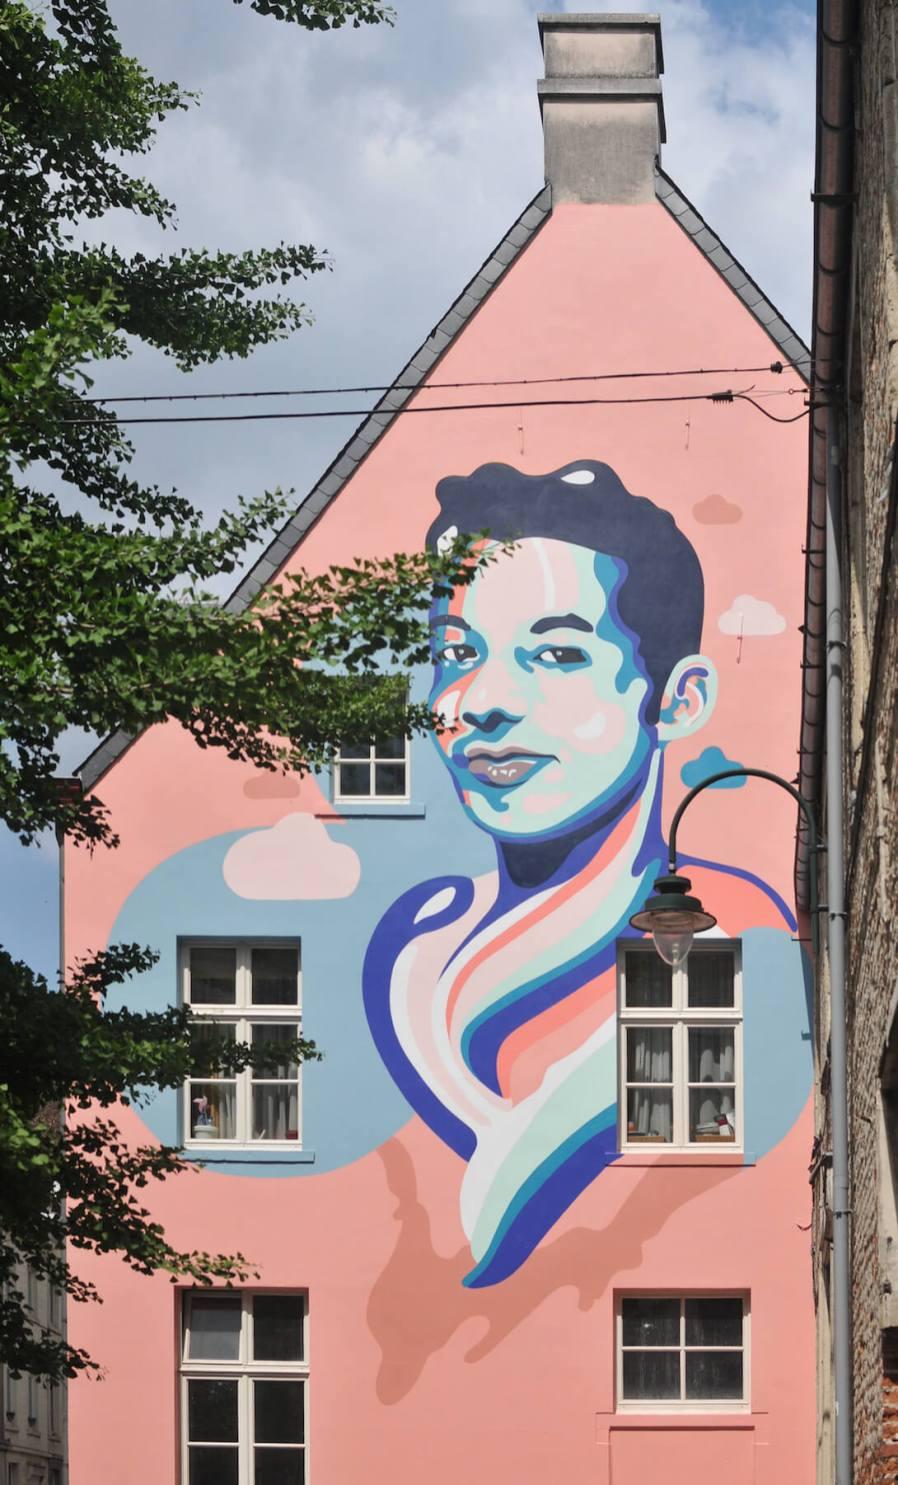 Ihsane-jarfi-Anthea-Missy-mural-Brussels-street-art-lgbtq-fanny-seligmann-2